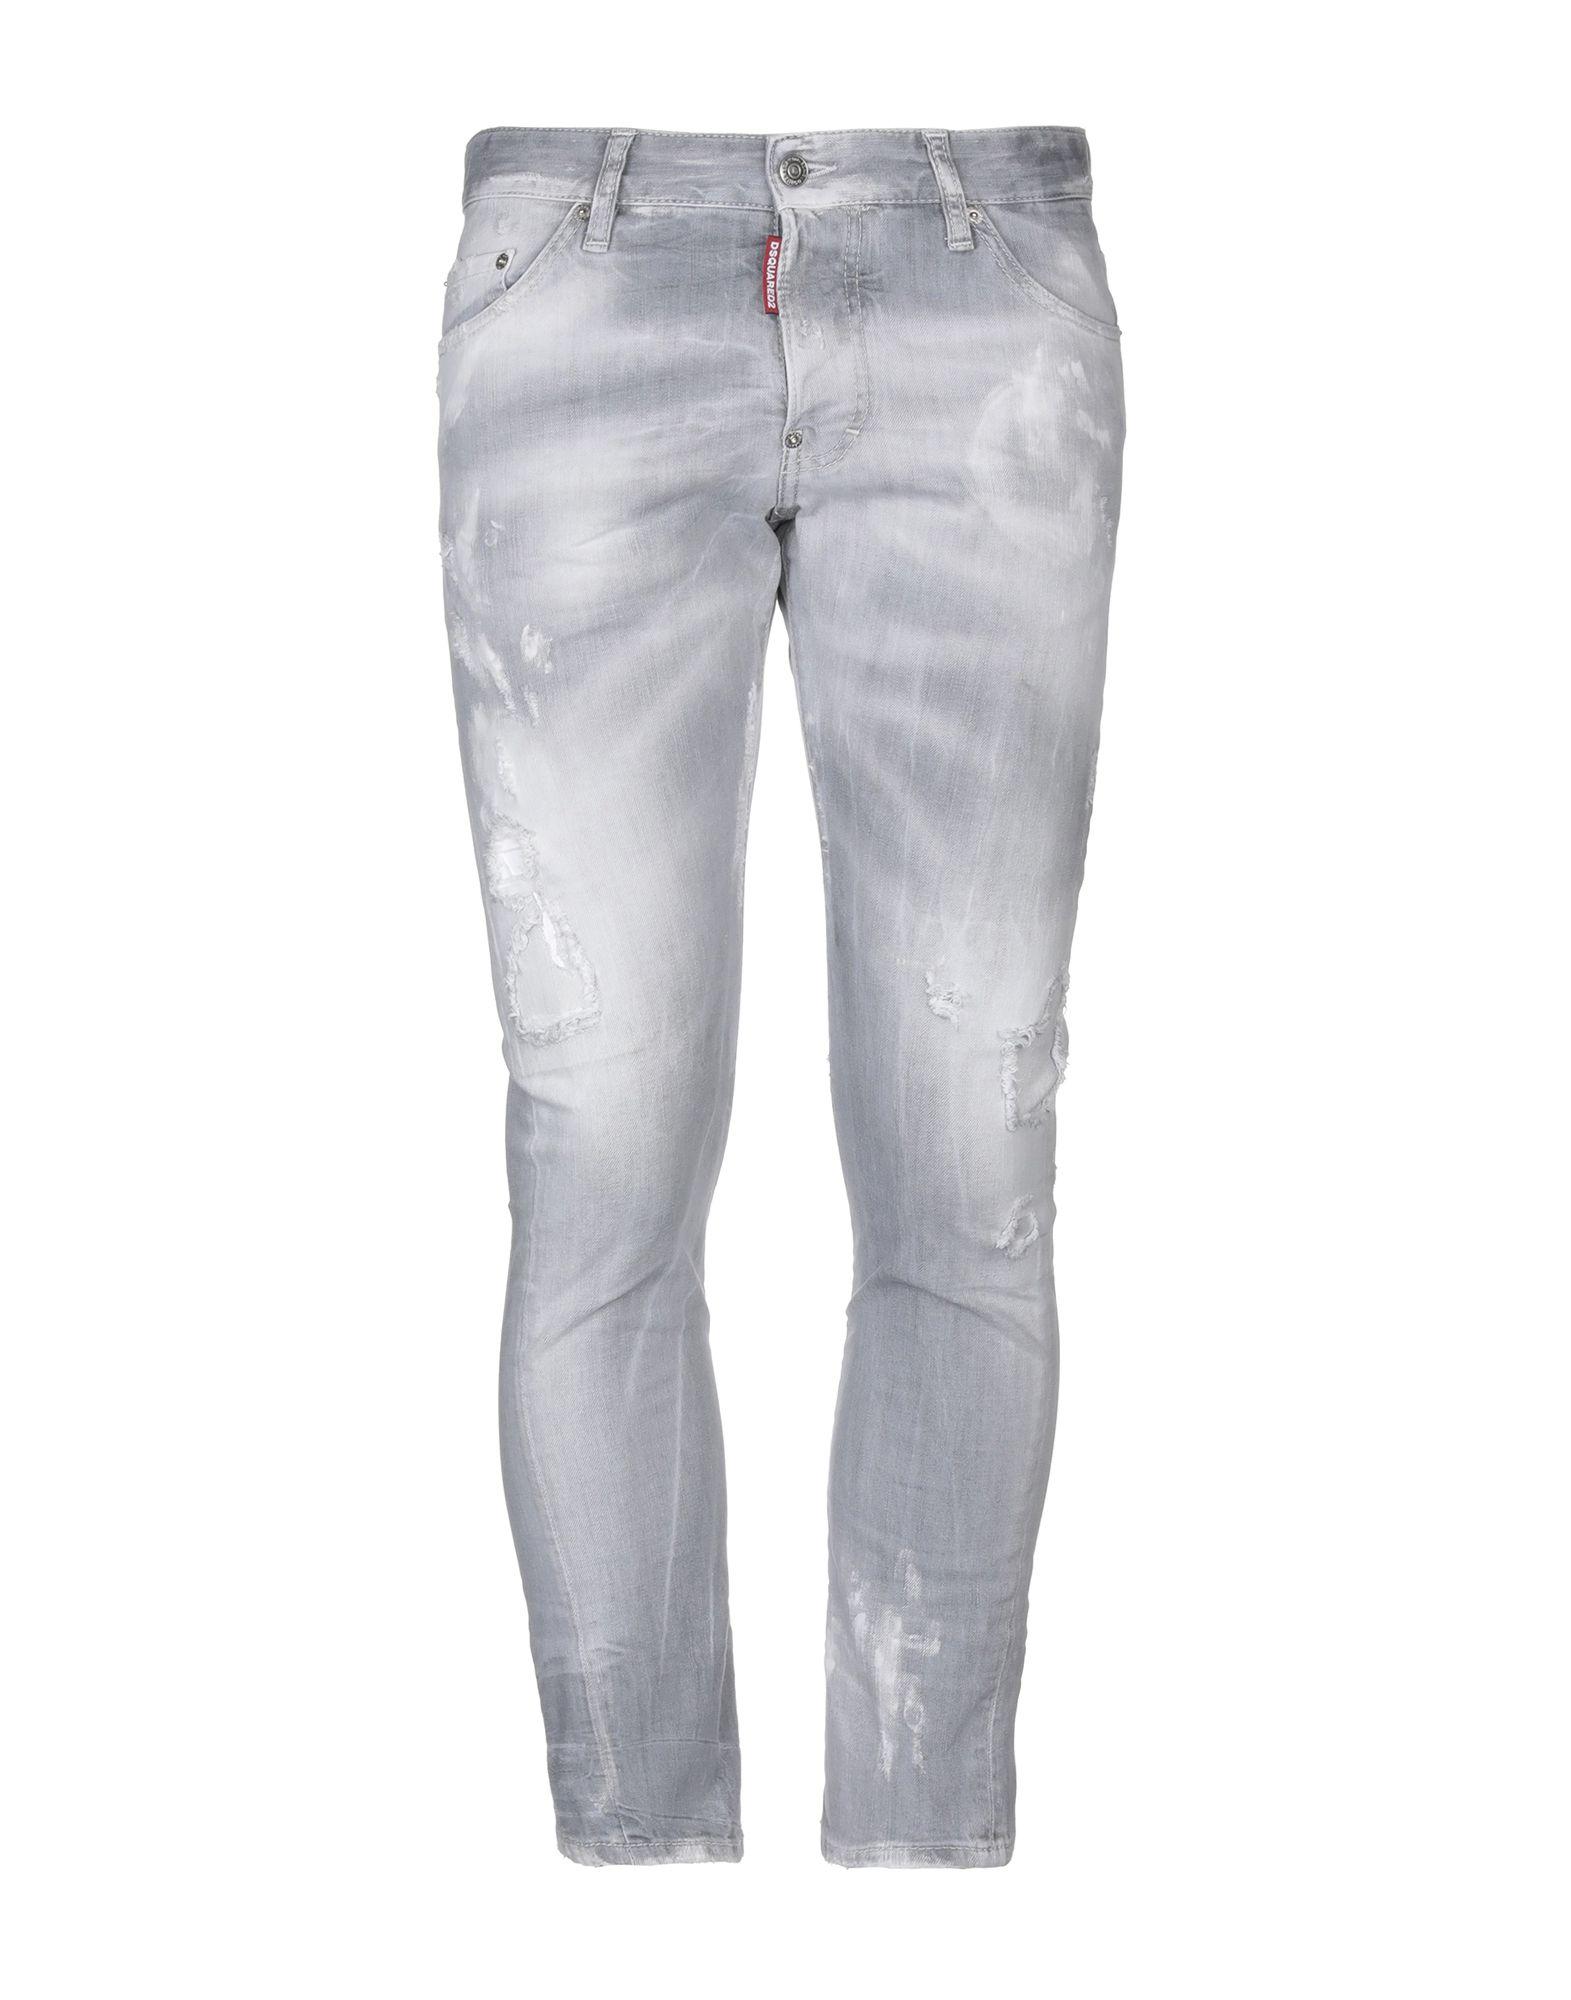 Dsquared2 Denim Pants - Men Dsquared2 Denim Pants online on YOOX United  States - 42695365NI dbe1841256e9